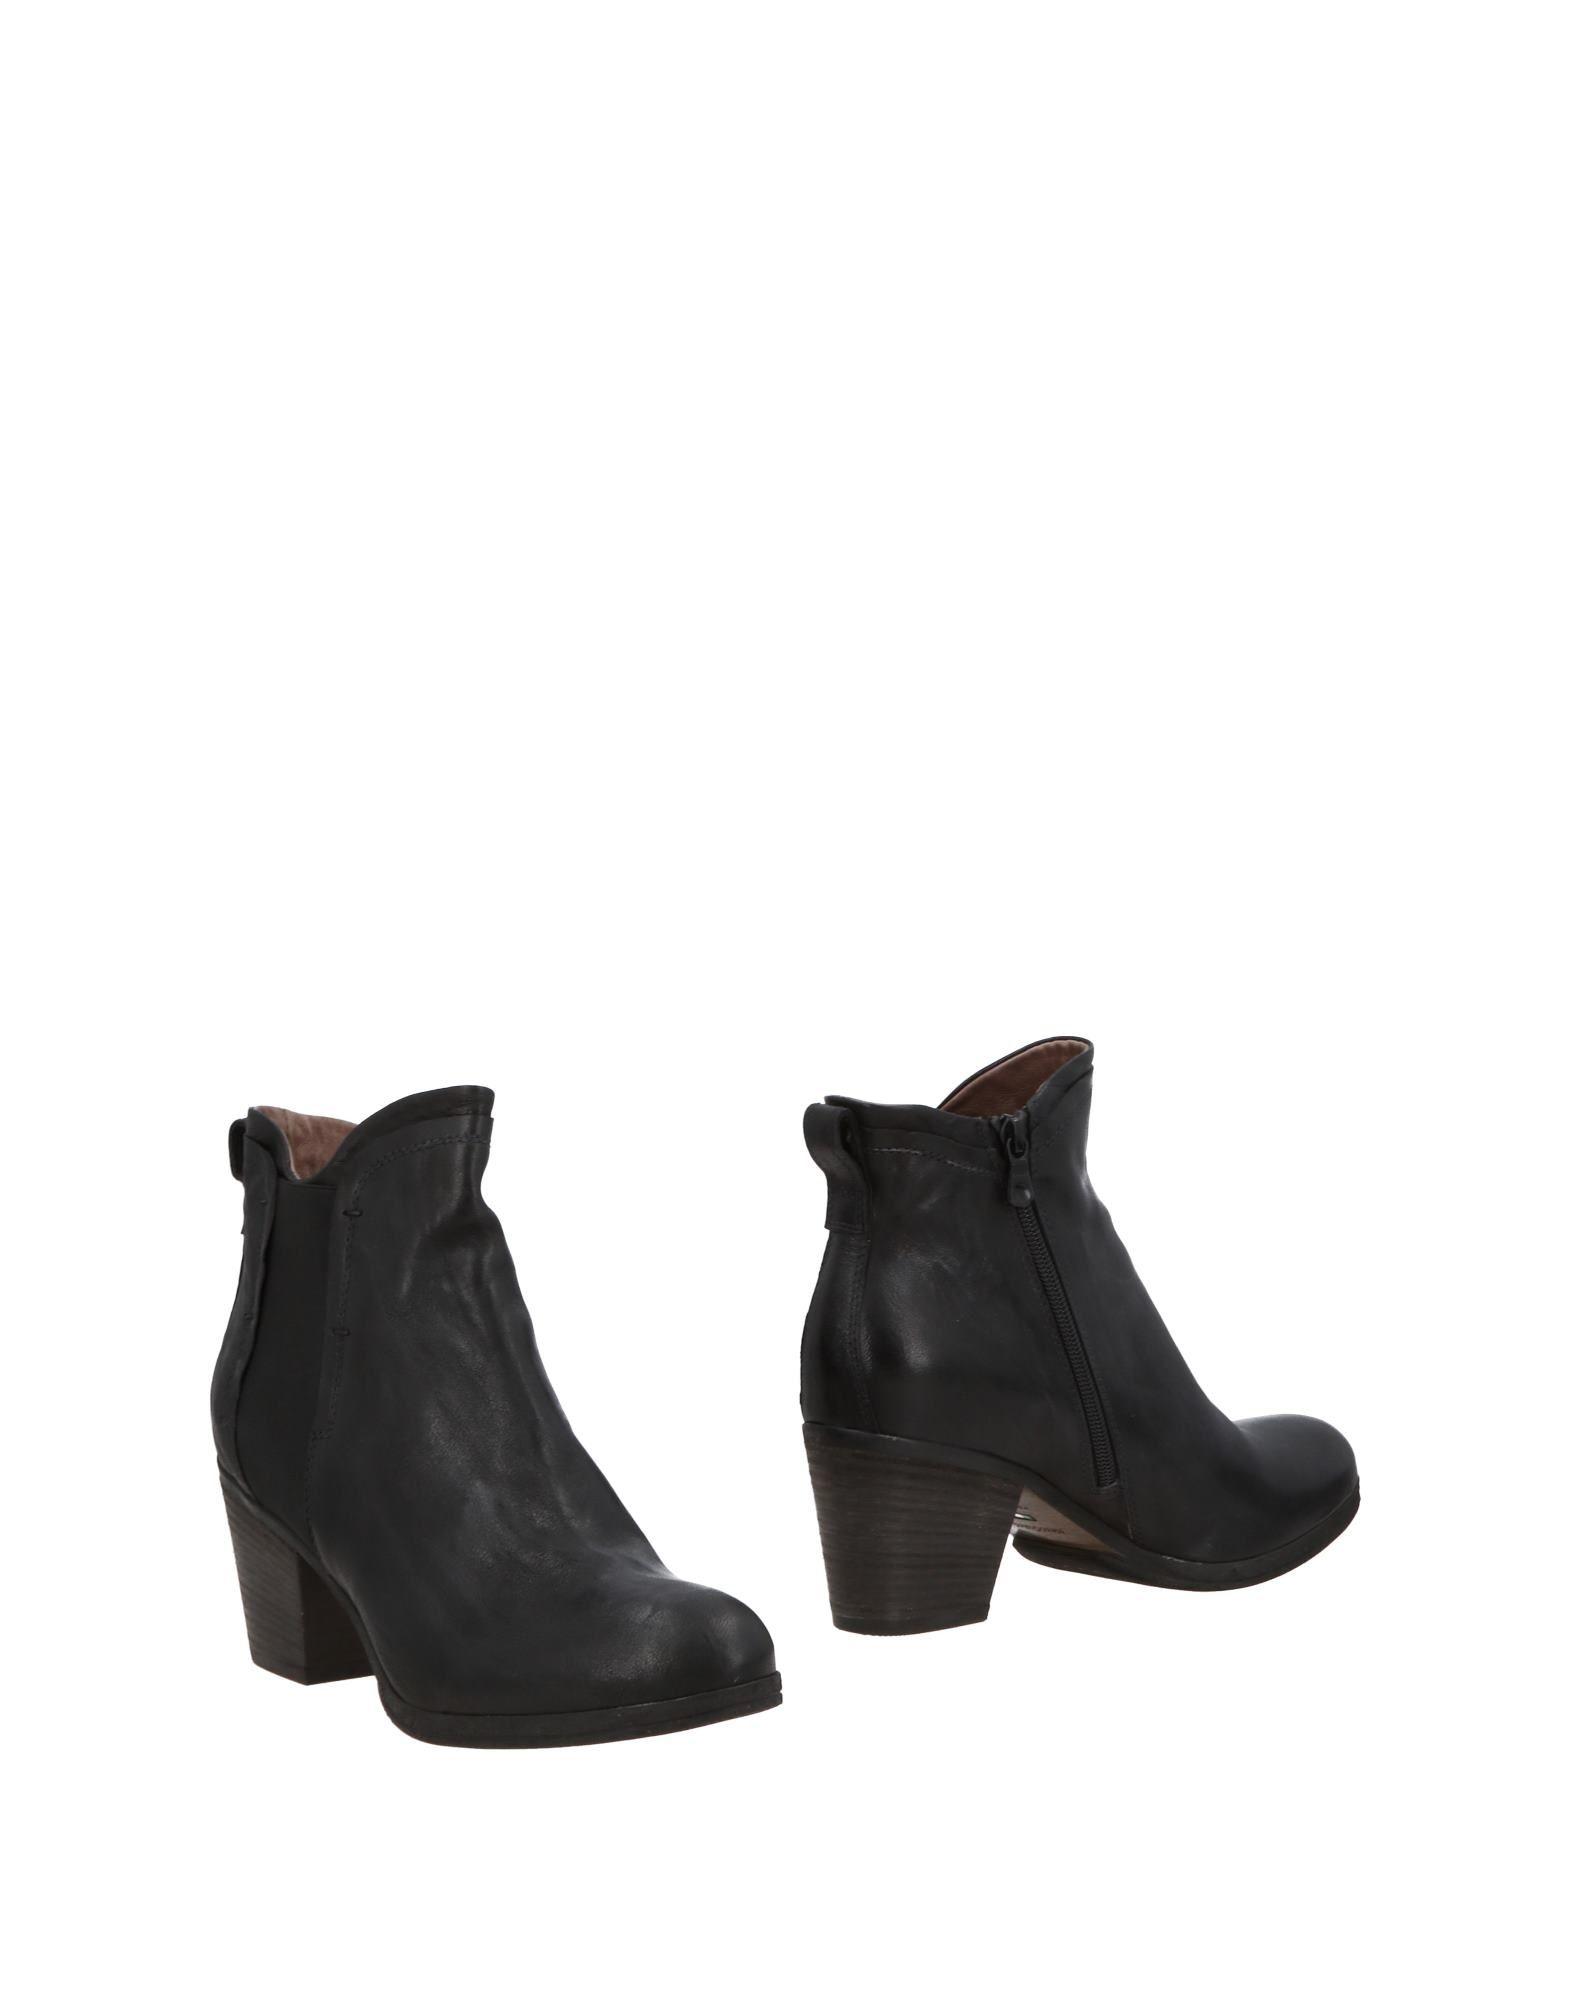 Nero Giardini Stiefelette Damen  11487453JU Gute Qualität beliebte Schuhe